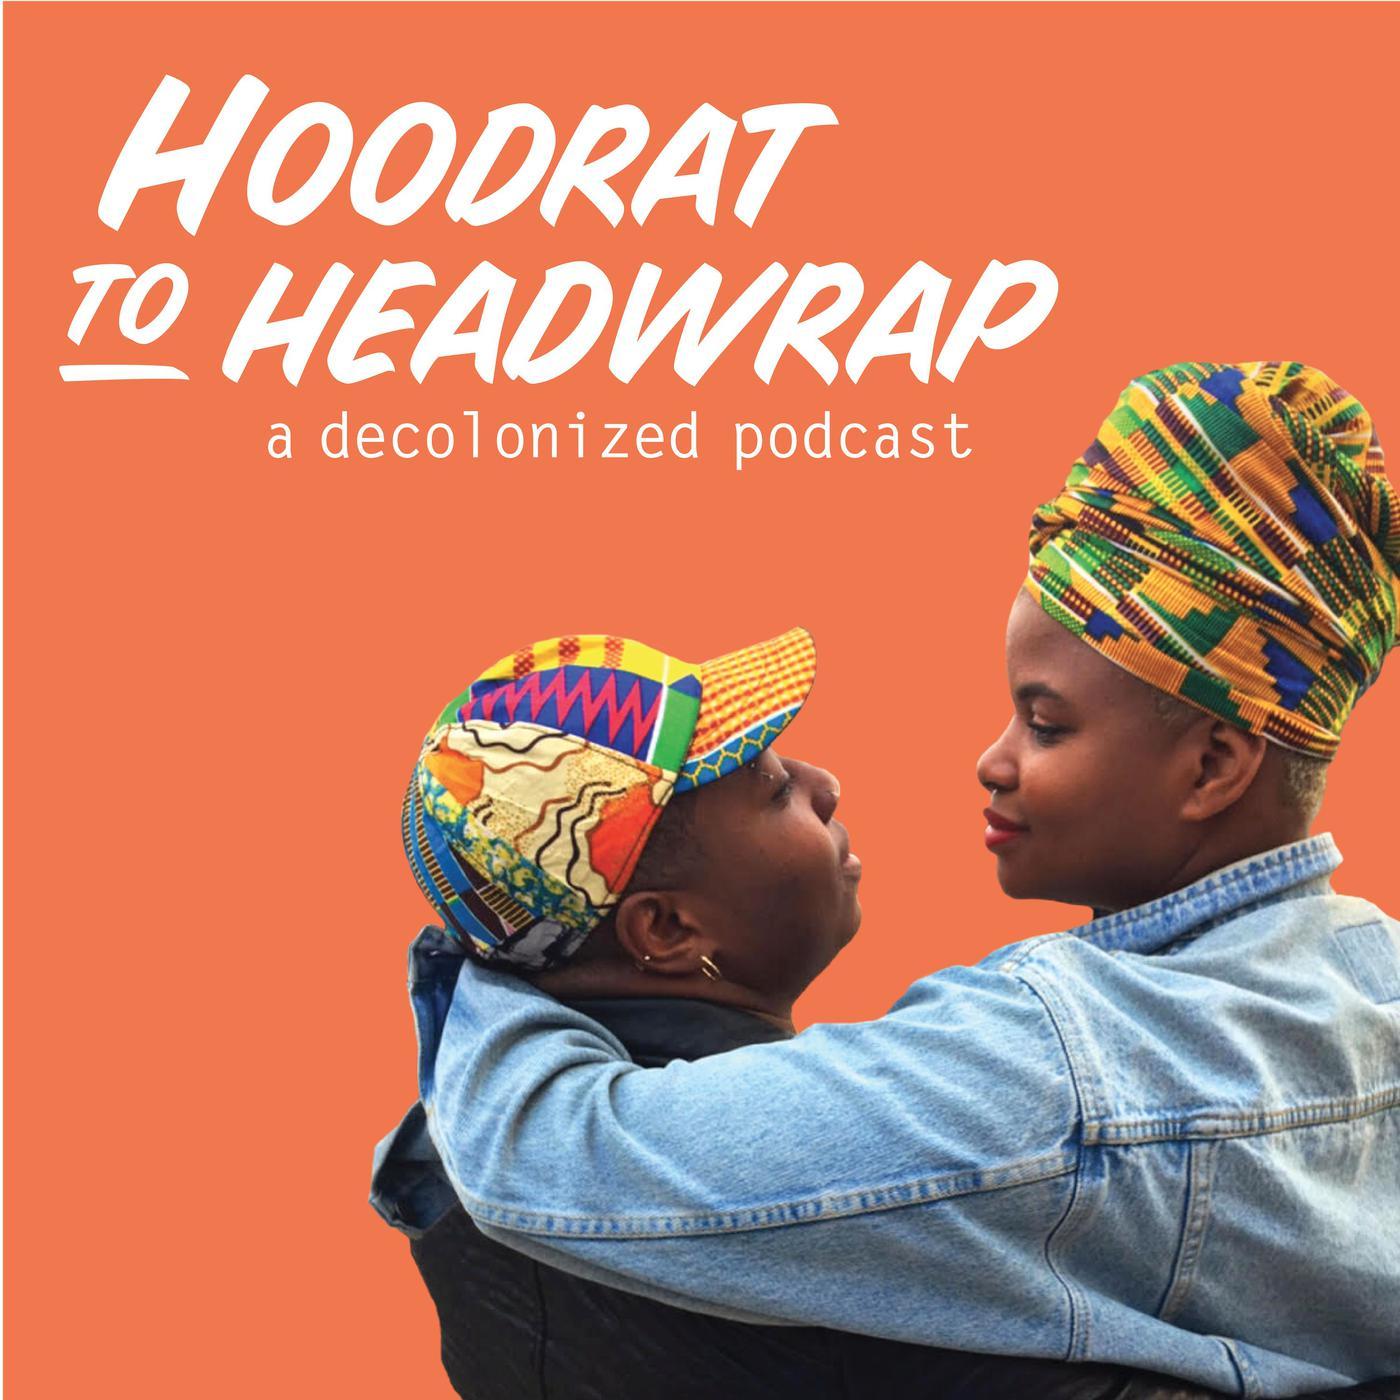 hoodrat to headwrap poodcast